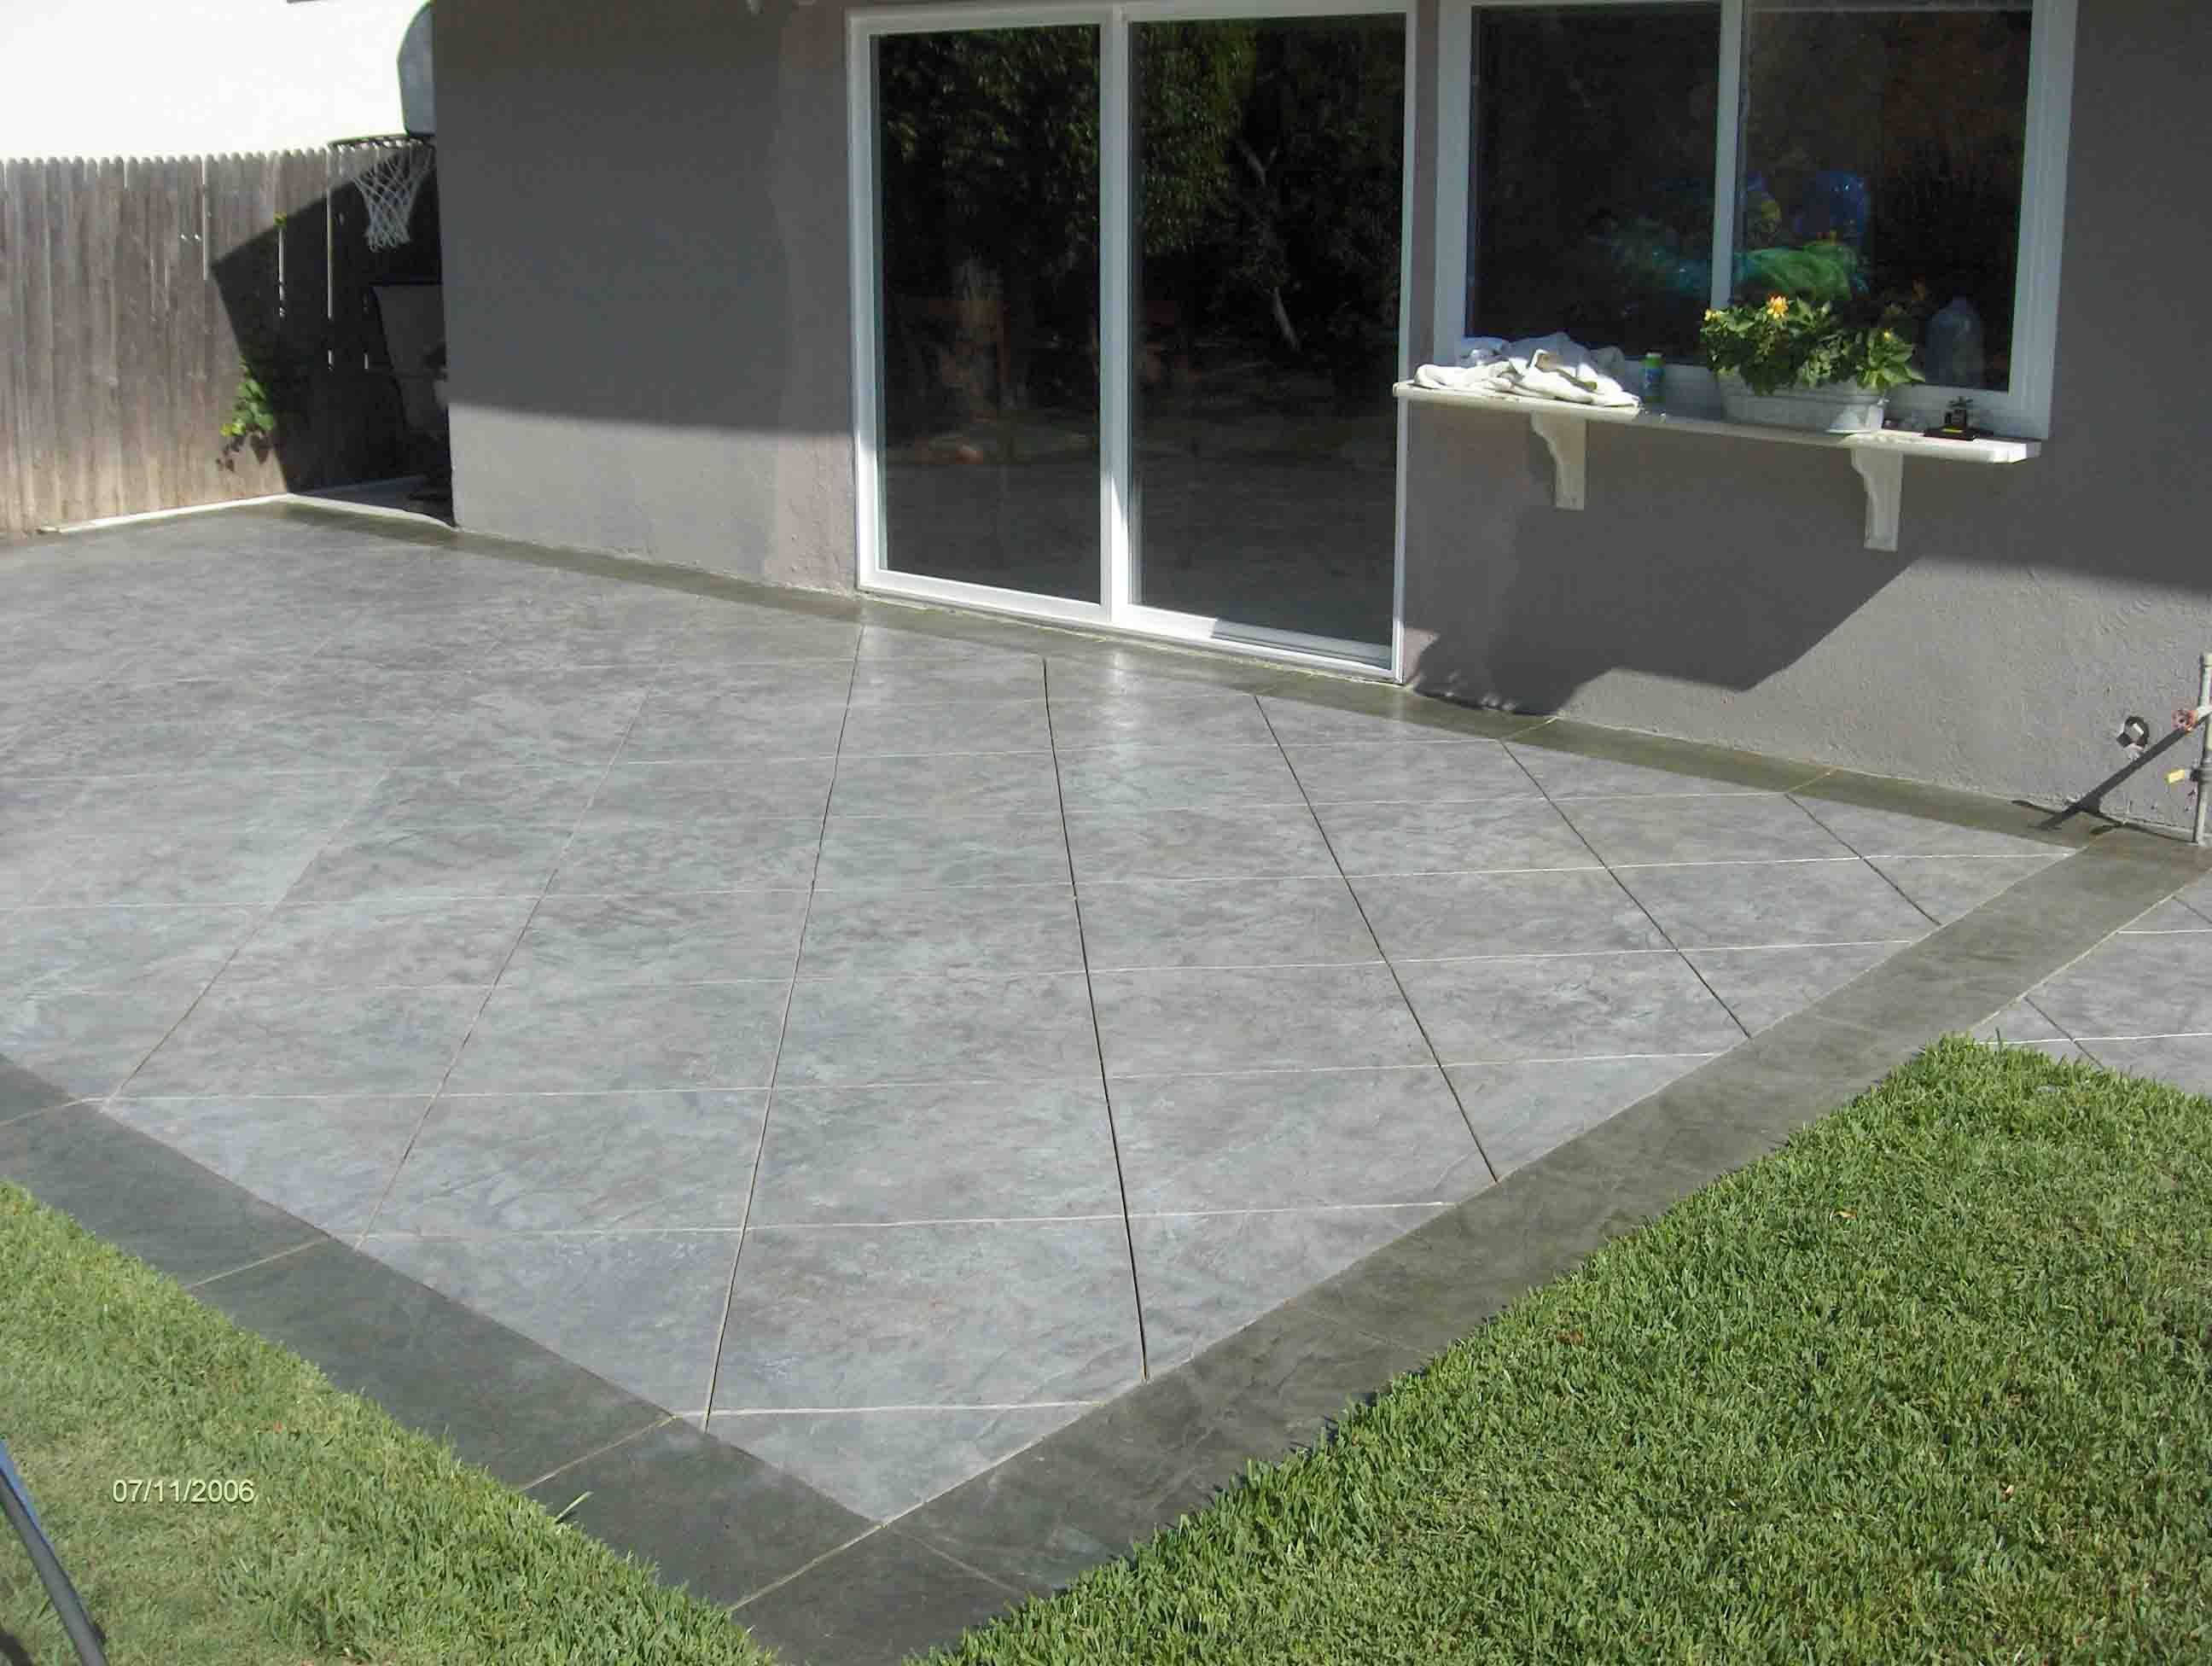 Square Fire Pit Patio Designs | square paver patio designs ... on Square Concrete Patio Ideas id=51465